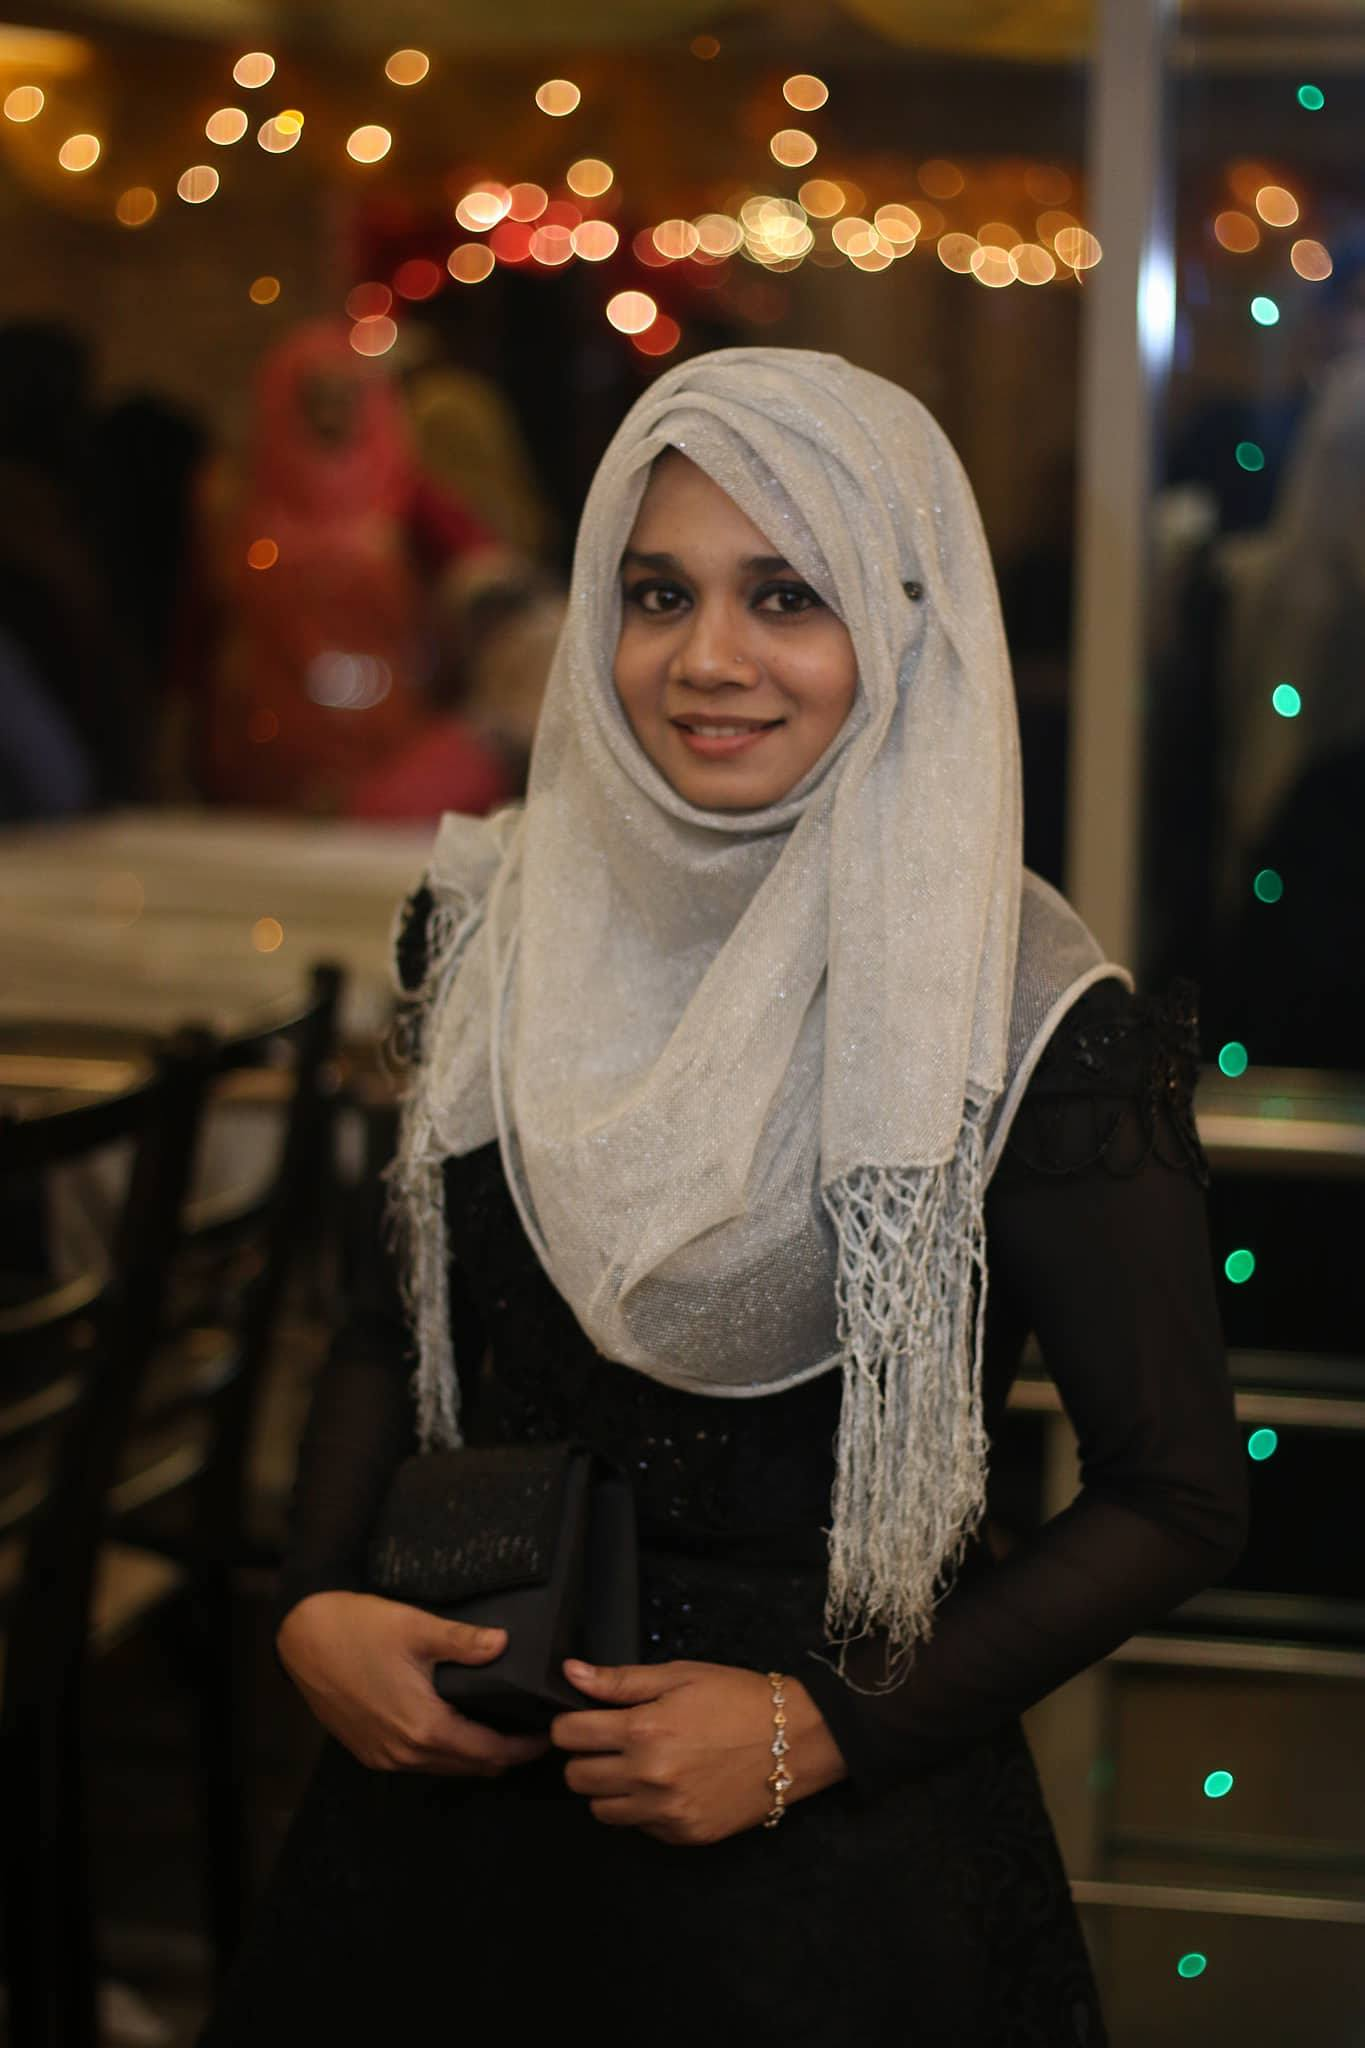 Shahnaz Siddiqua